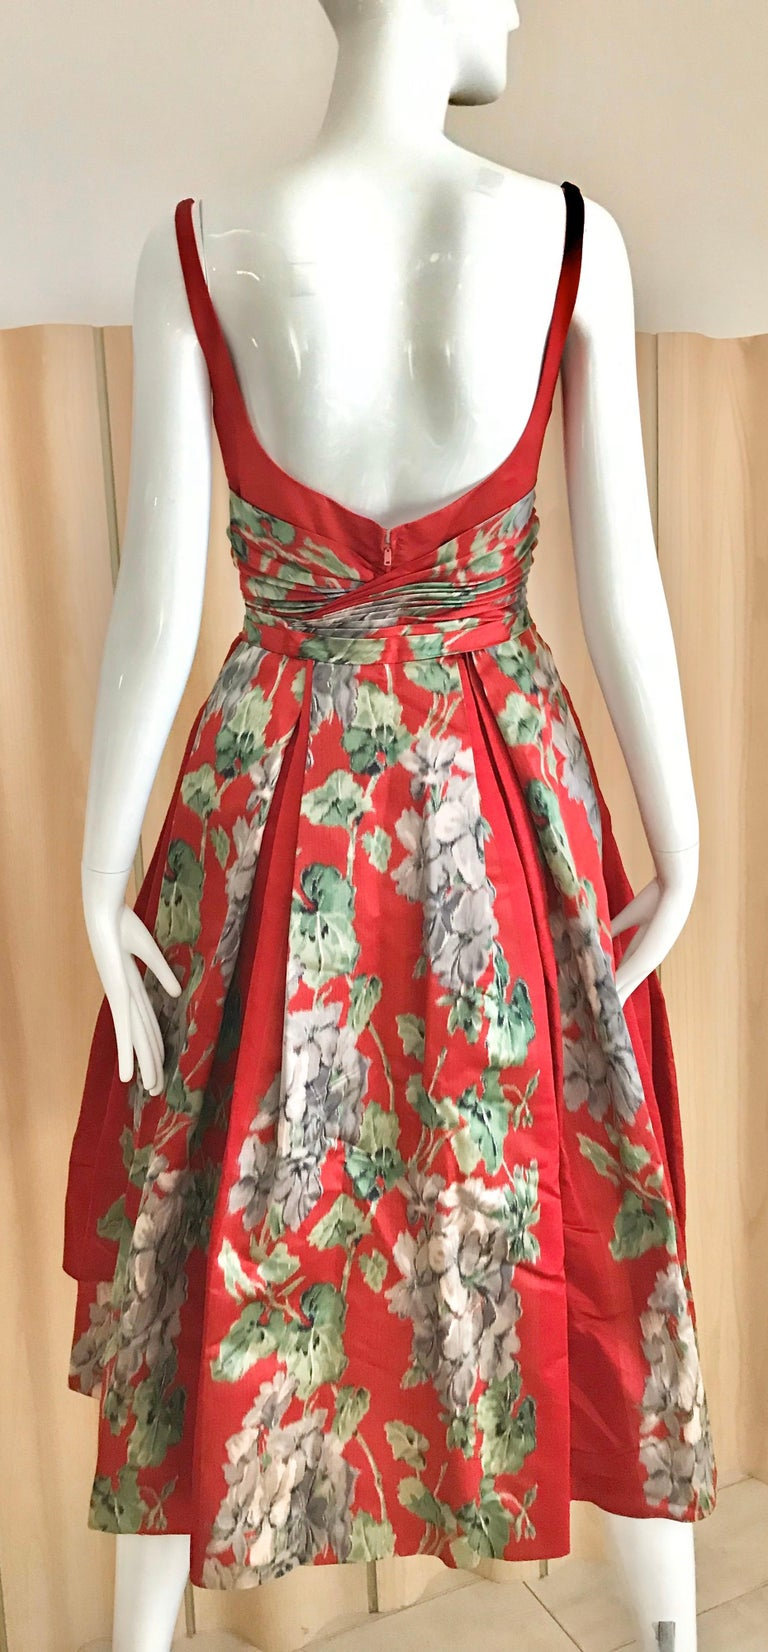 Women's 1950s Hattie Carnegie Red Silk Floral Print Cocktail Dress For Sale